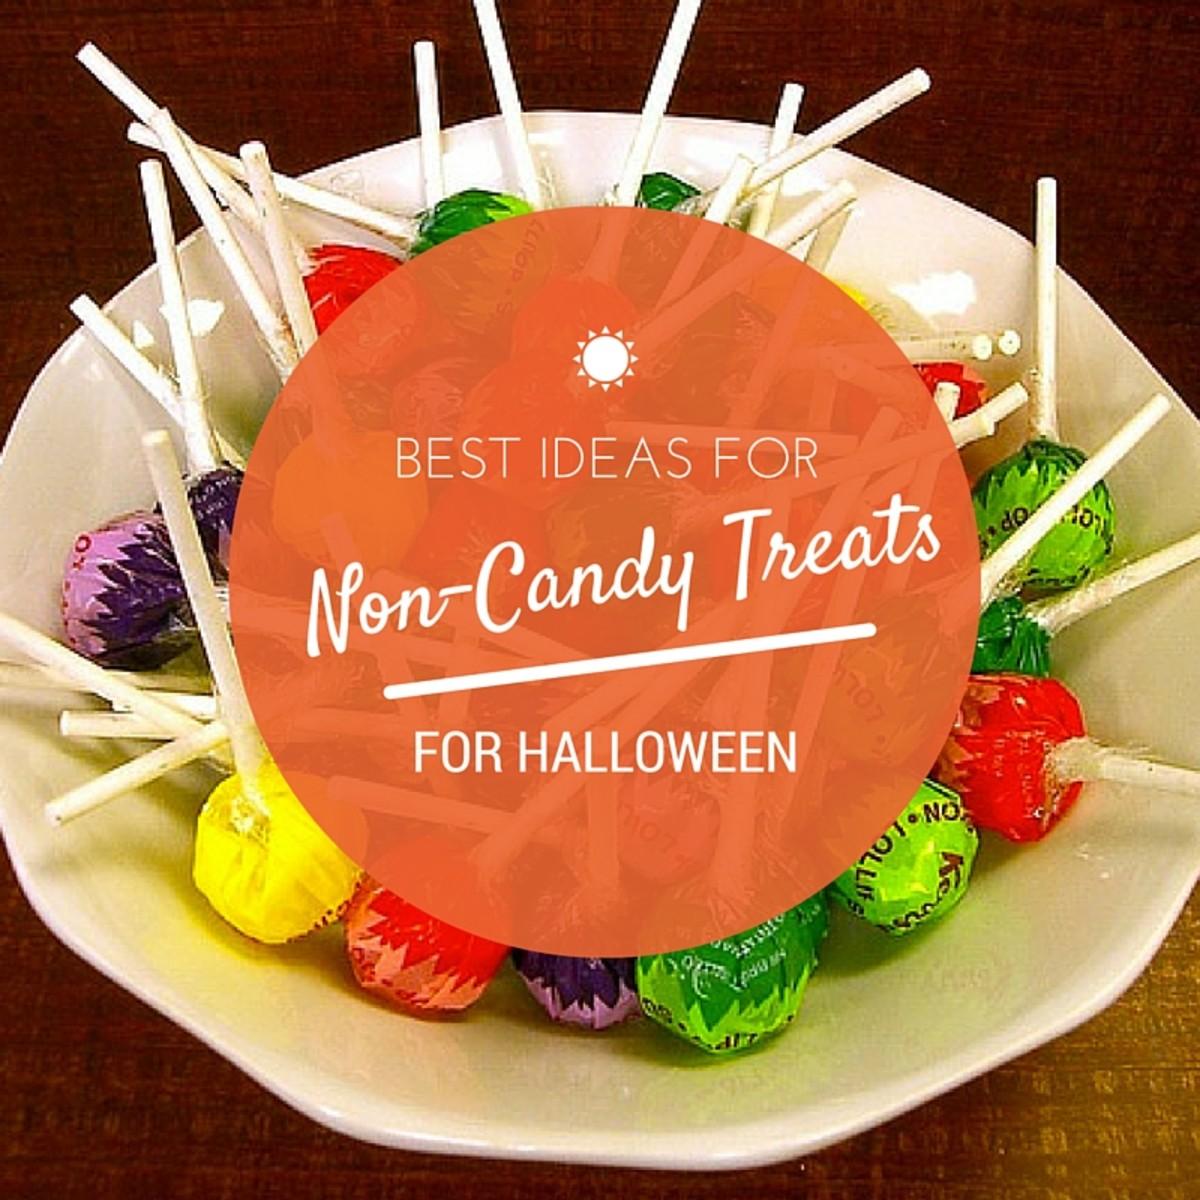 Best Non-Candy Halloween Treat Ideas